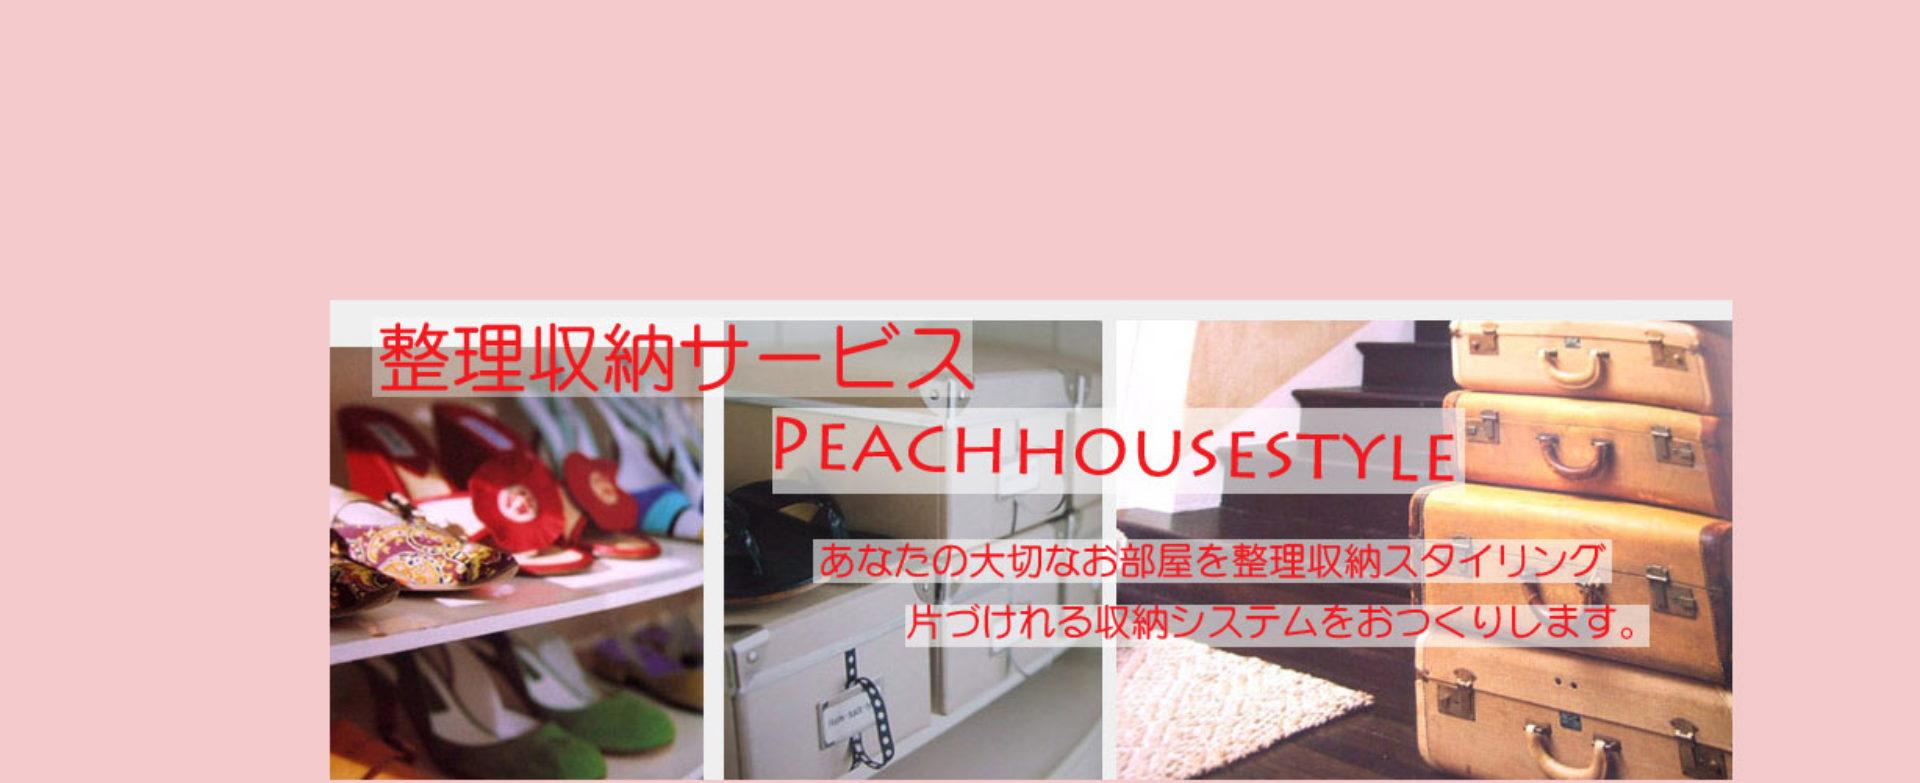 関西大阪・整理収納サービス peachhousestyle